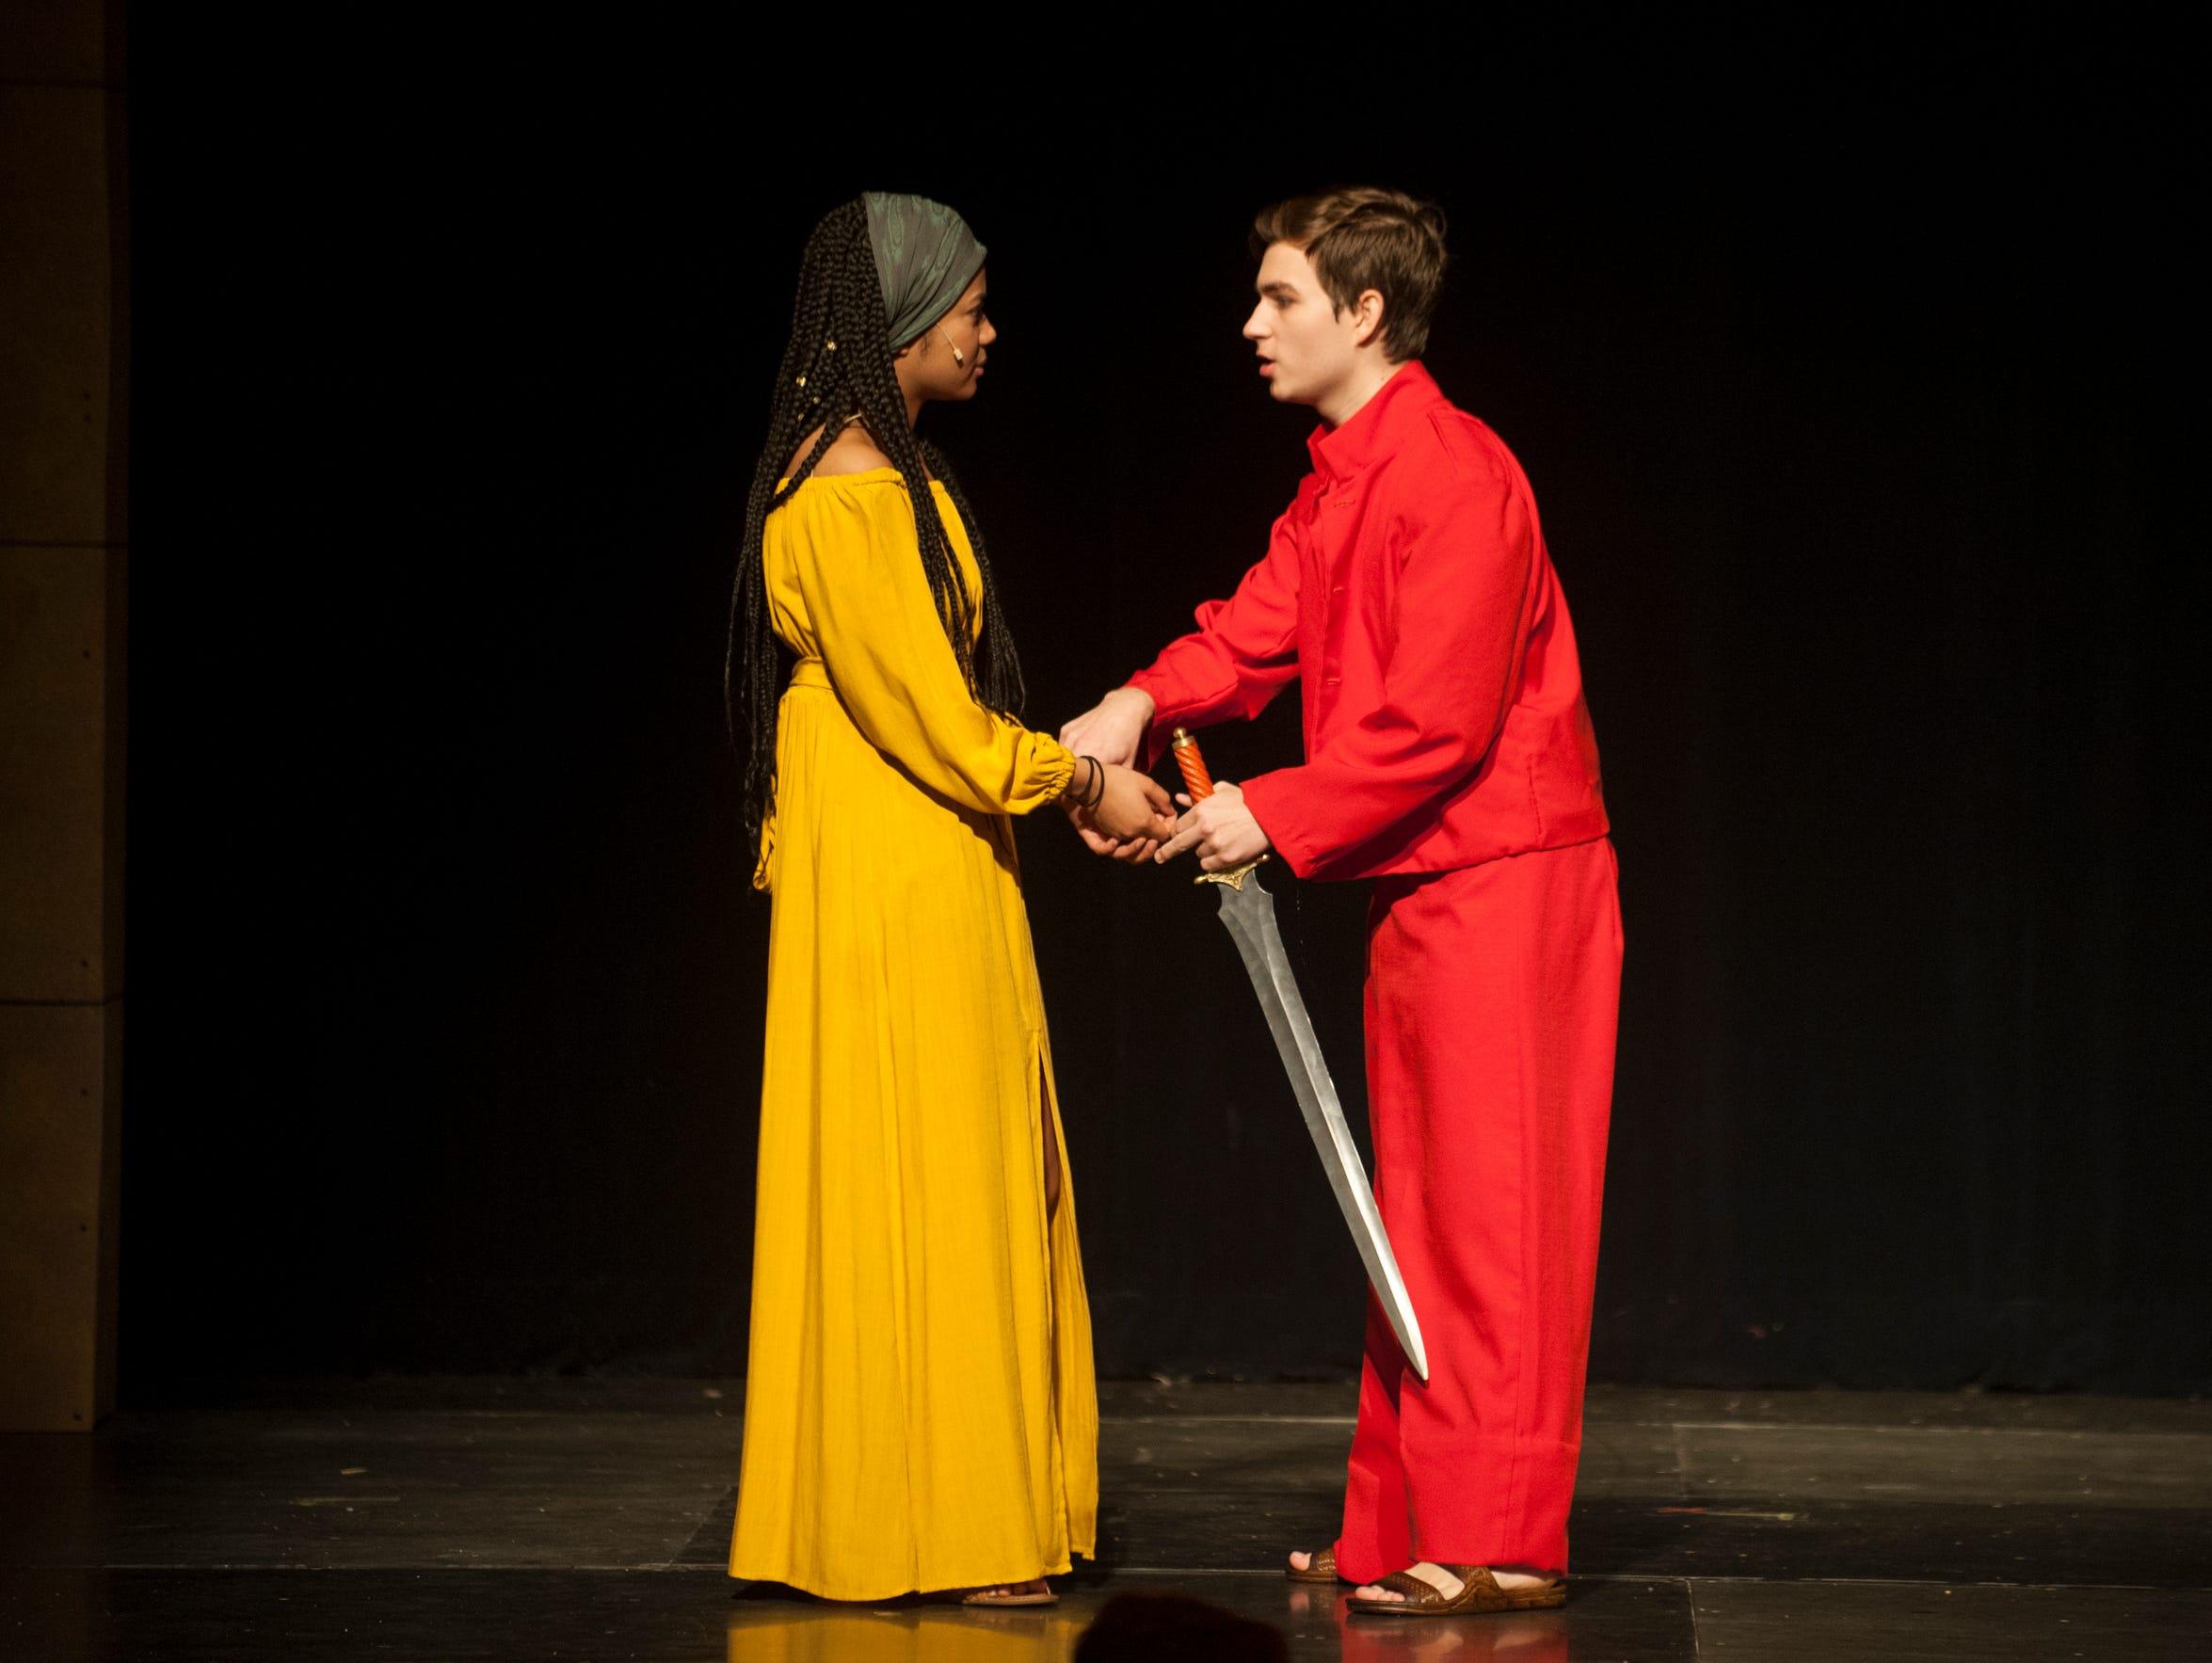 Lenape senior Jaelyn Alexander (left) plays the role